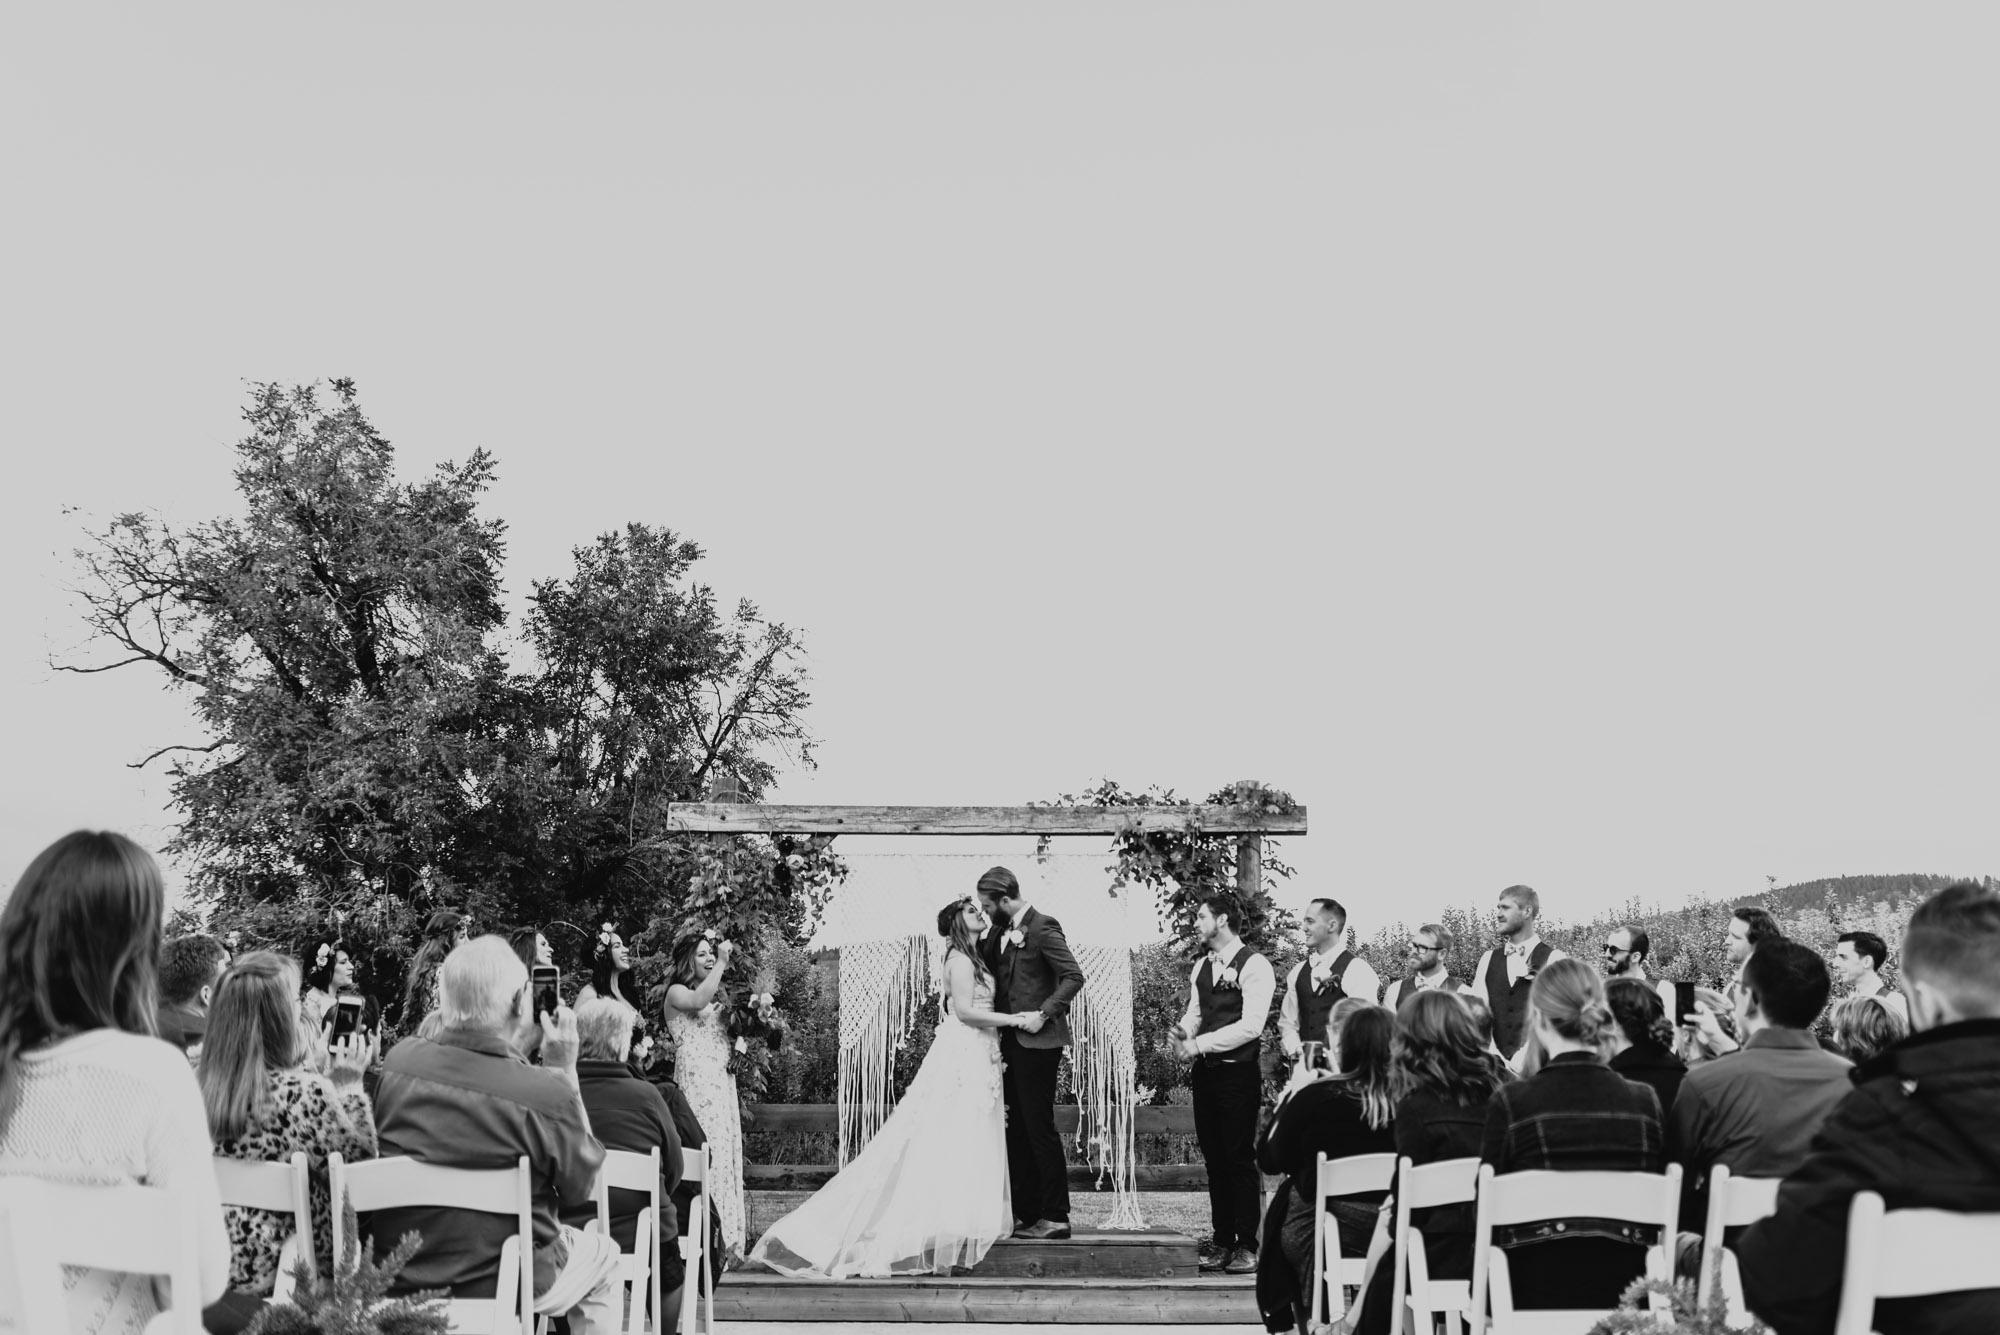 Outdoor-Summer-Ceremony-Washington-Wedding-Rainbow-5415.jpg